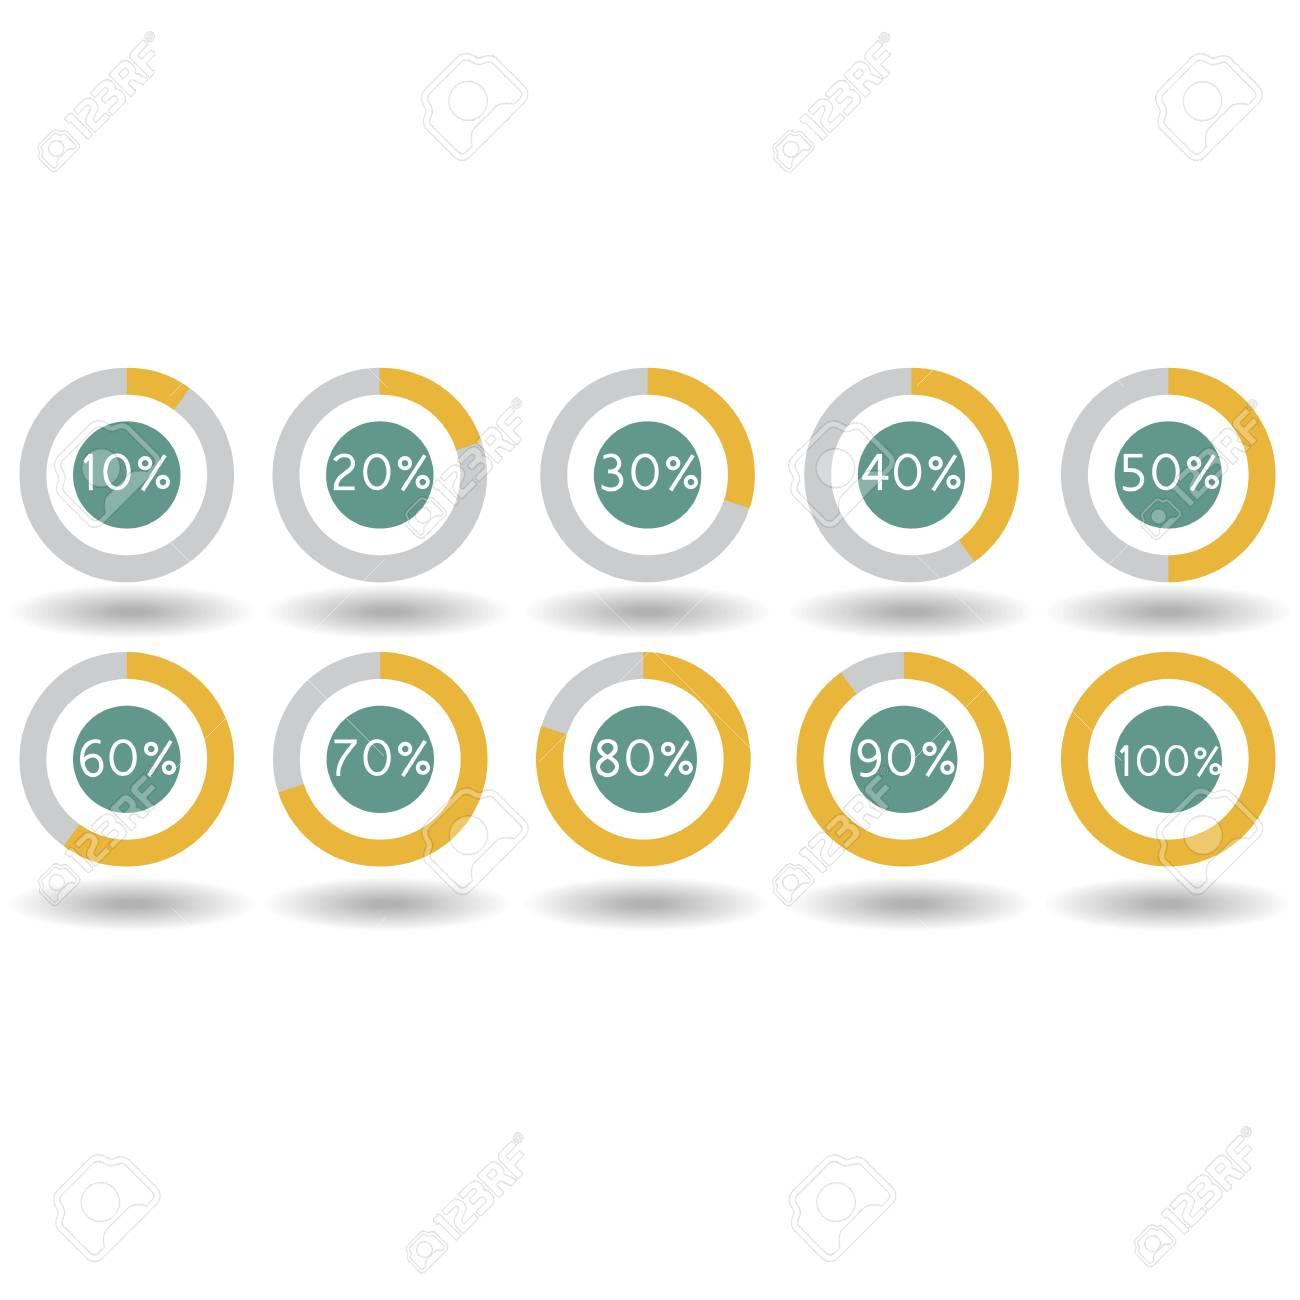 icons pie graph circle percentage yellow chart 10 20 30 40 50